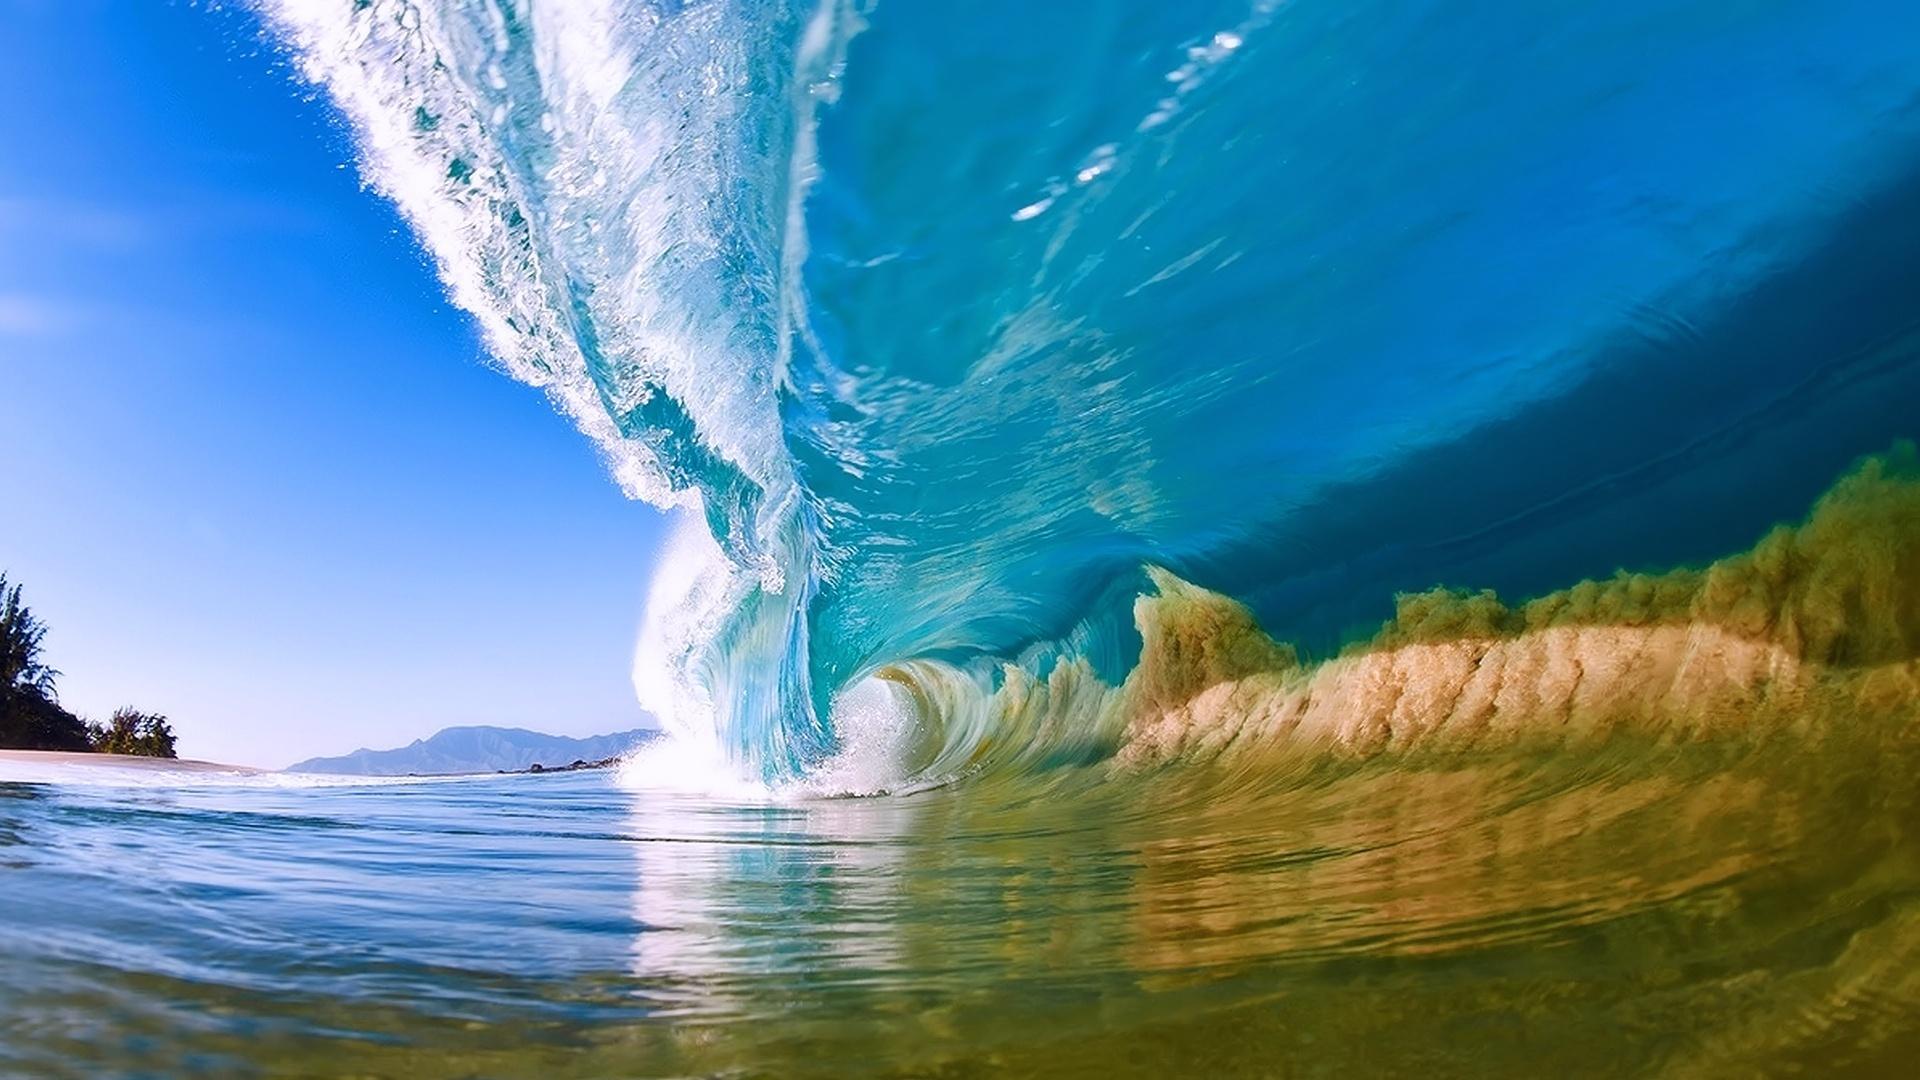 Download Natural Summer Ocean Wave Desktop HD Wallpaper Search more 1920x1080